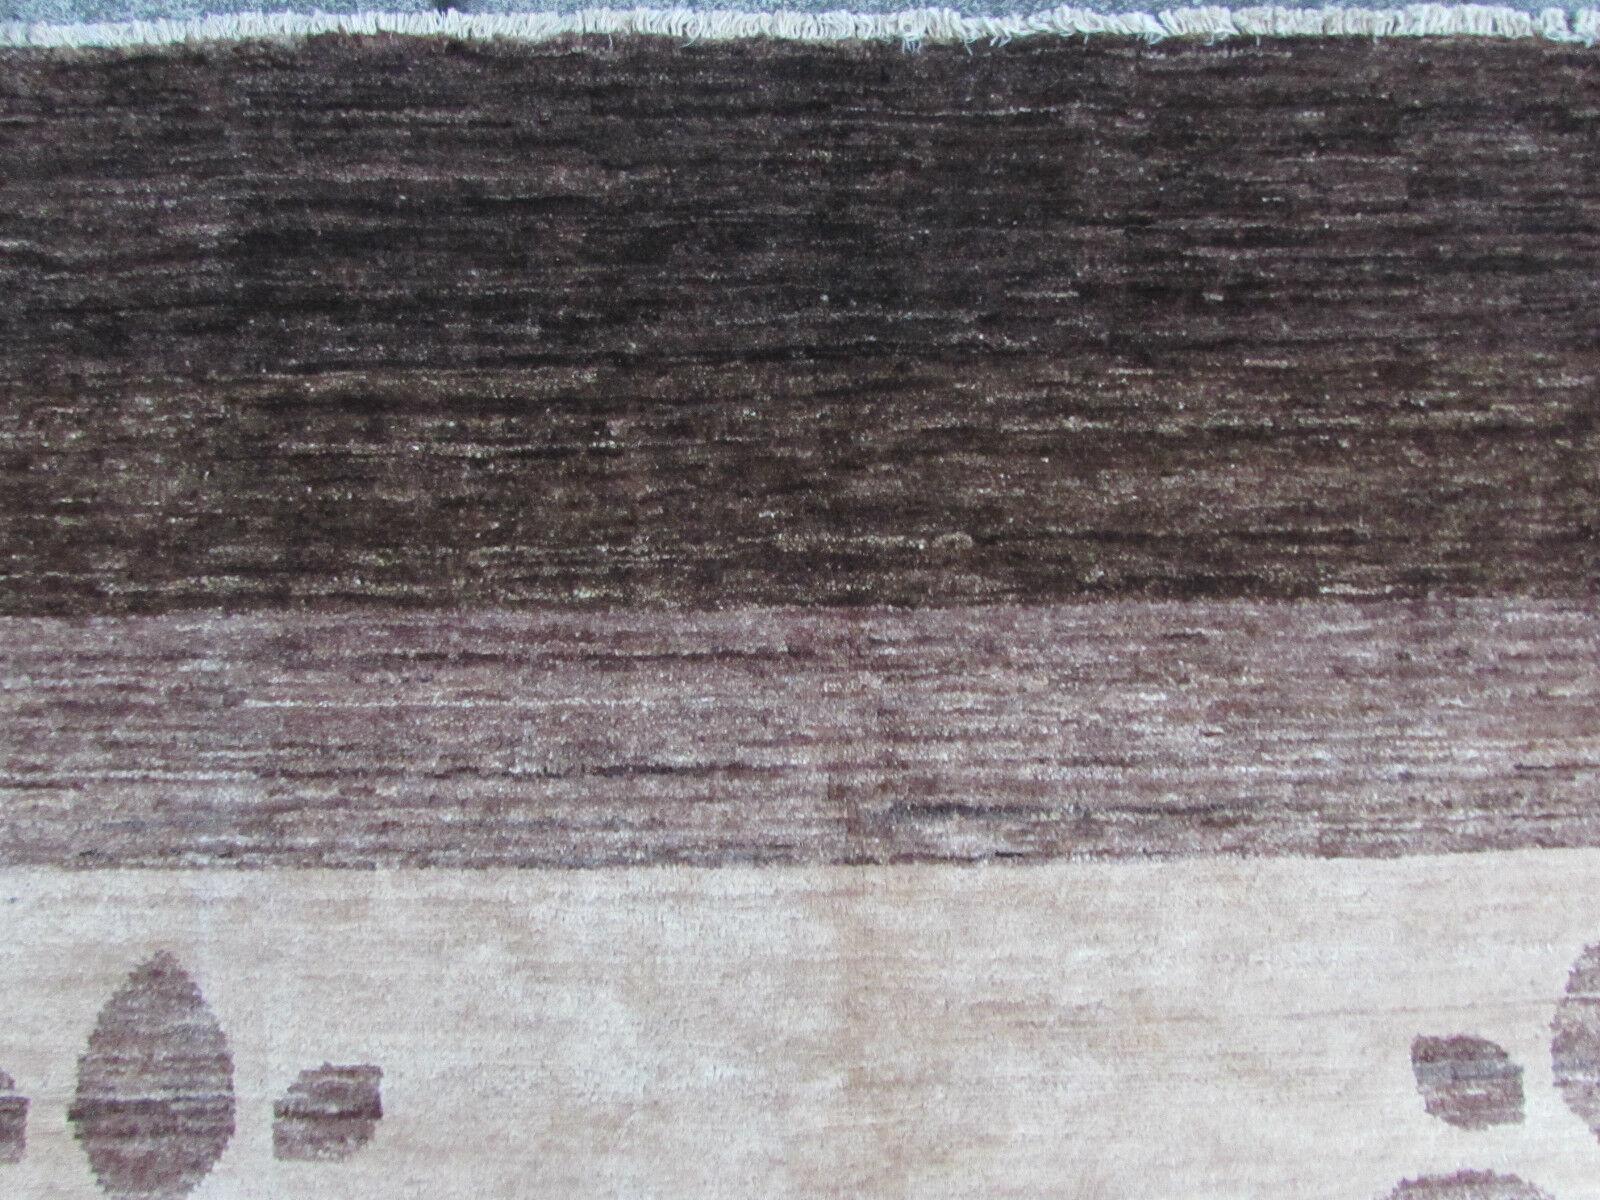 Wallario Leinwandbild 50 x 50 50 50 cm Abstrakte rote Blaumenschnörkel rot Blaumen rot 02cfb8